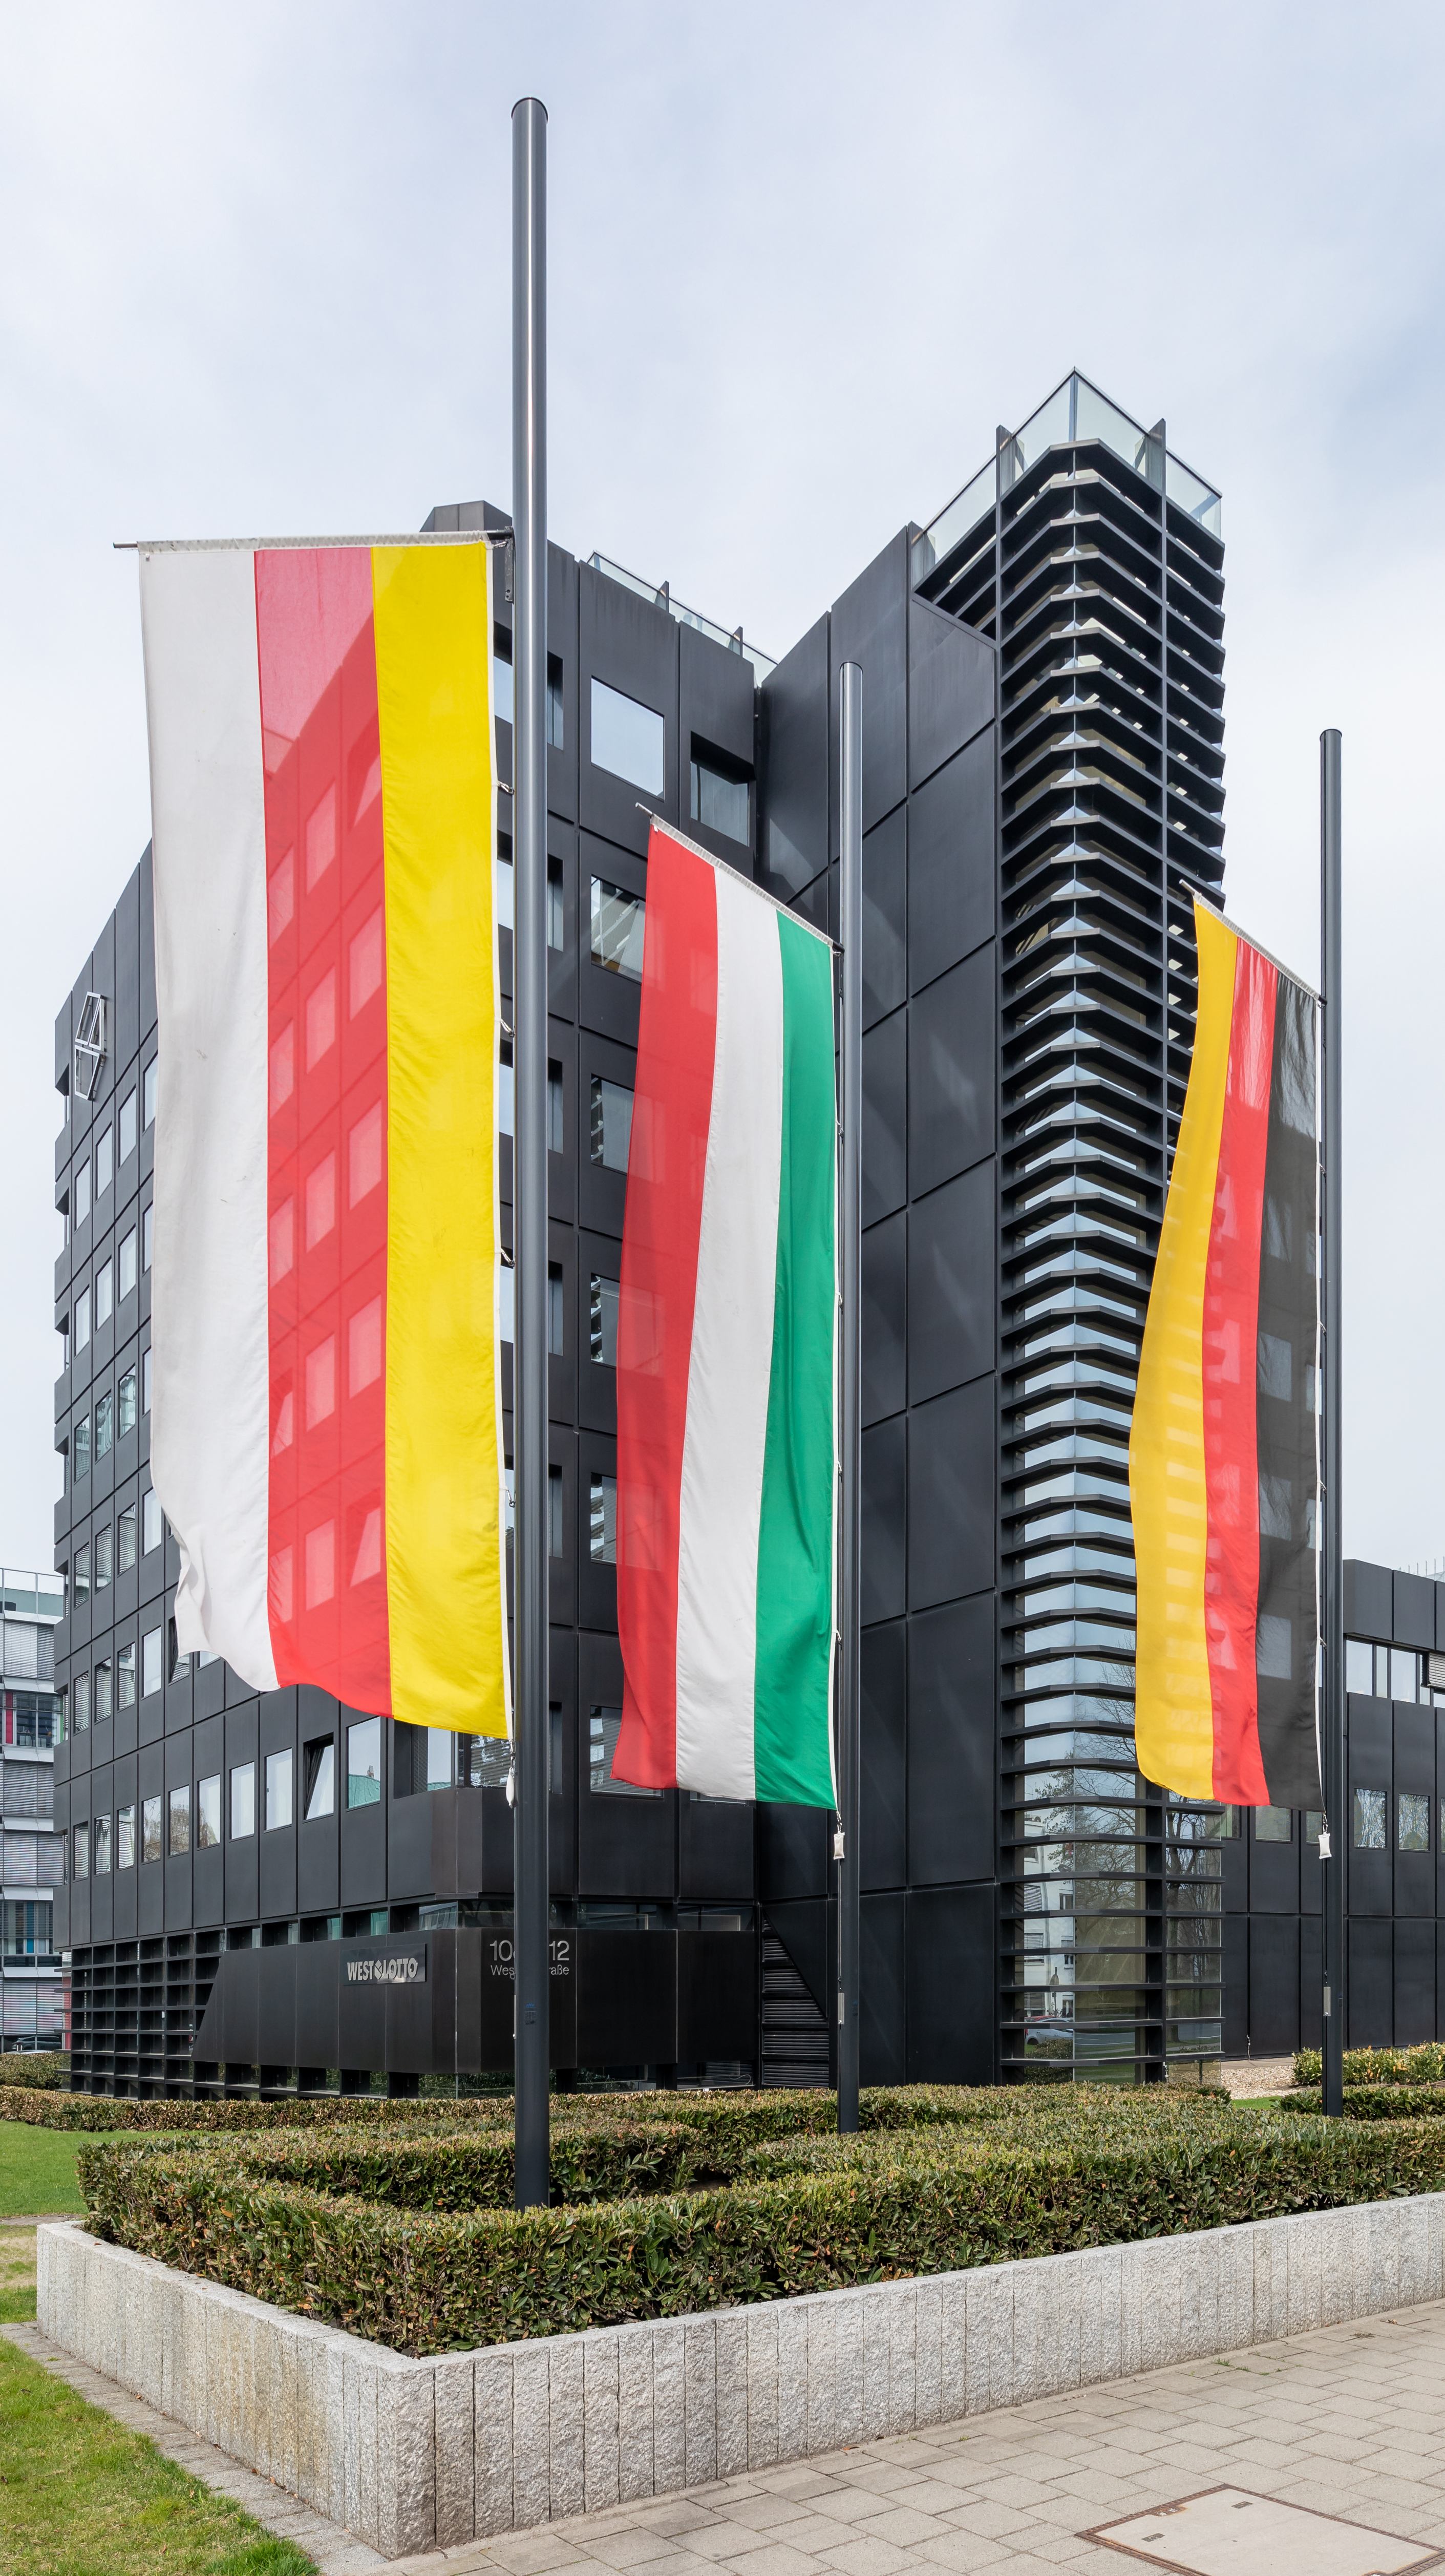 Westdeutsche Lotterie